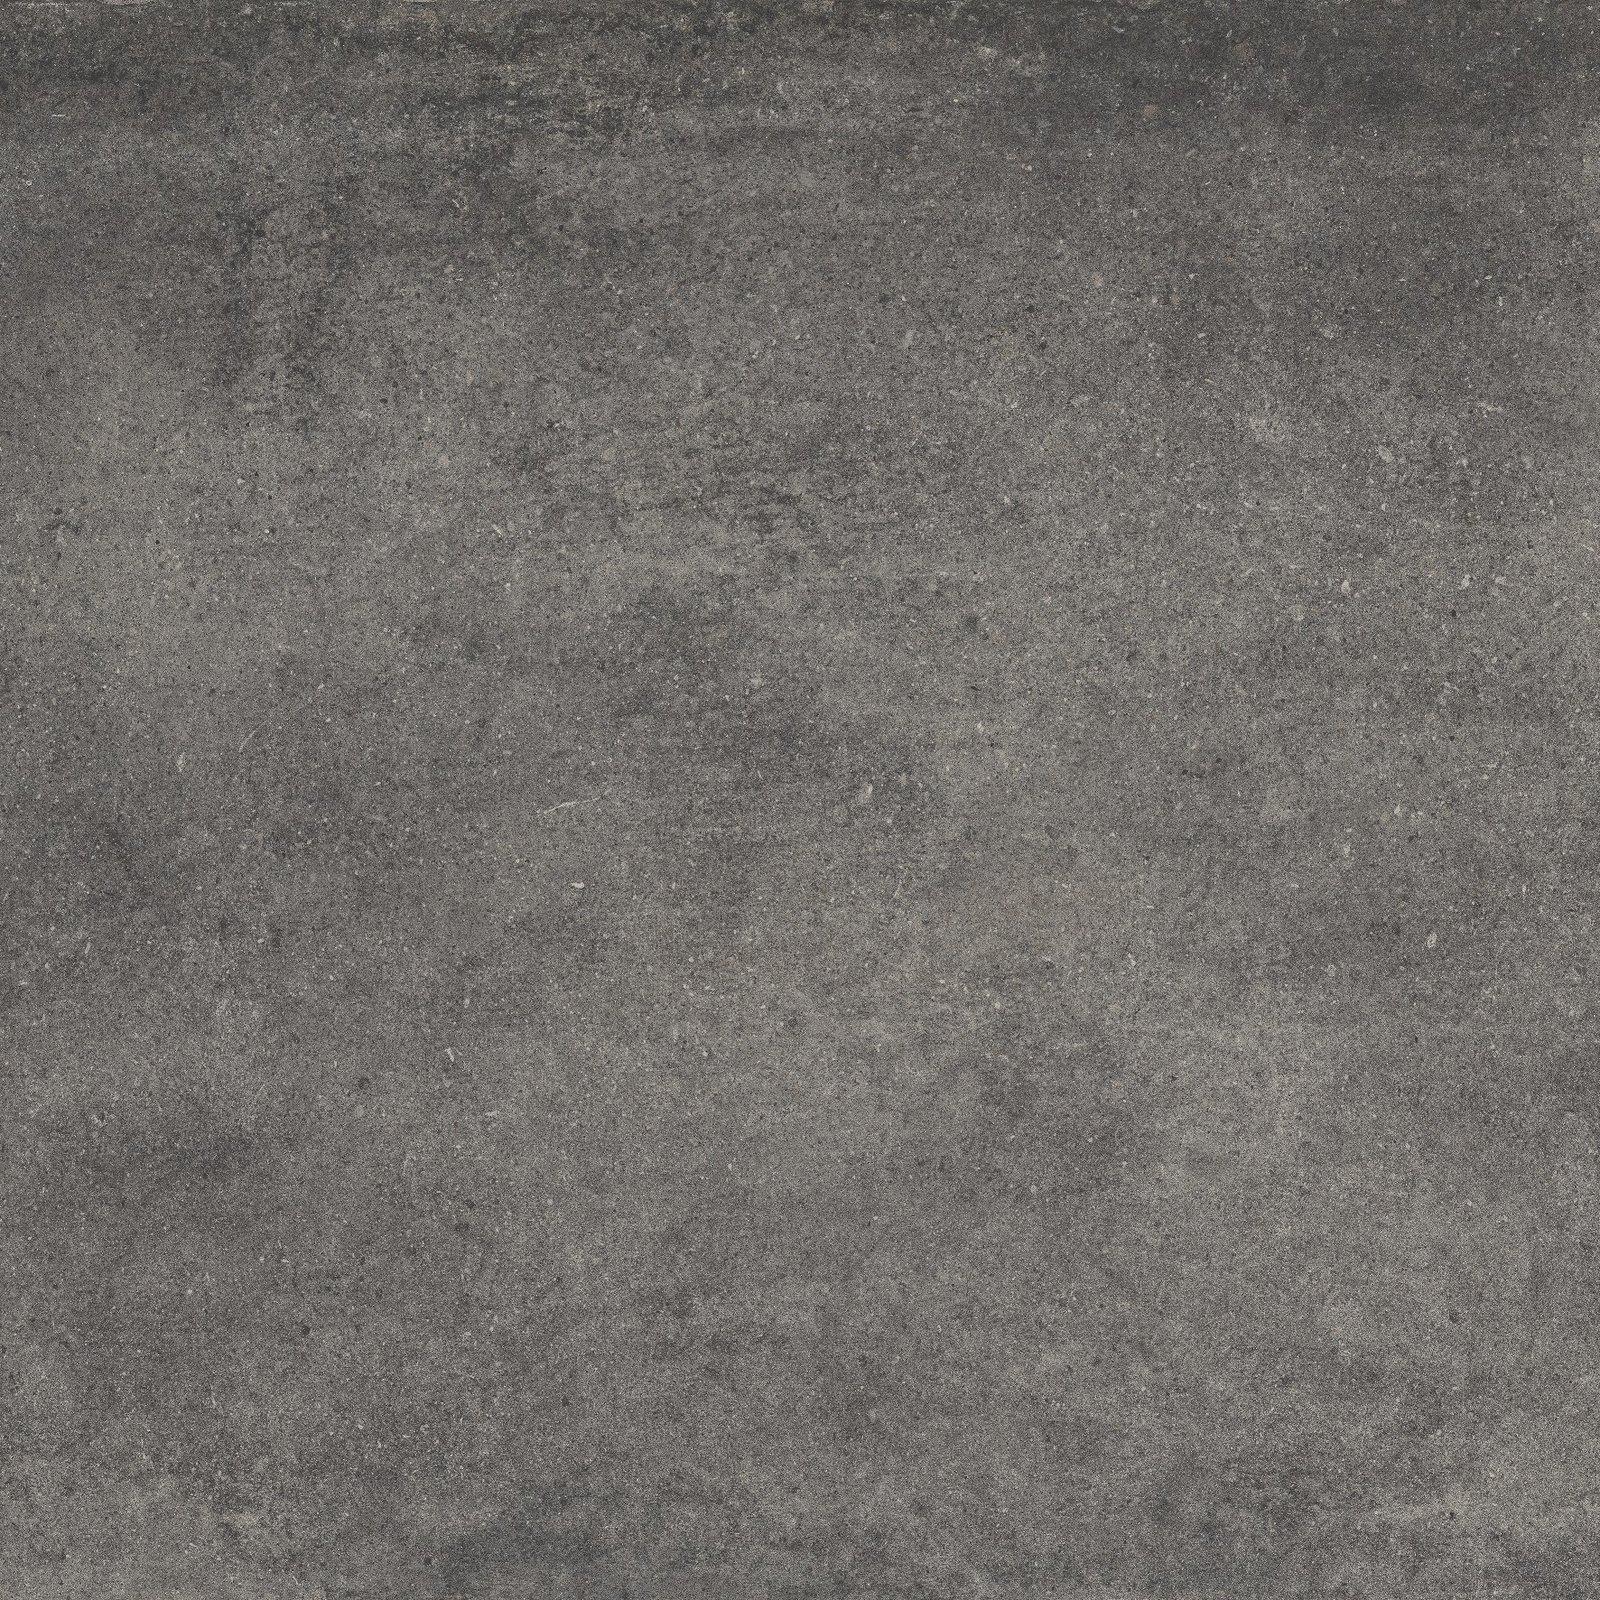 Плитка BLACK (X60RM9R) изображение 3